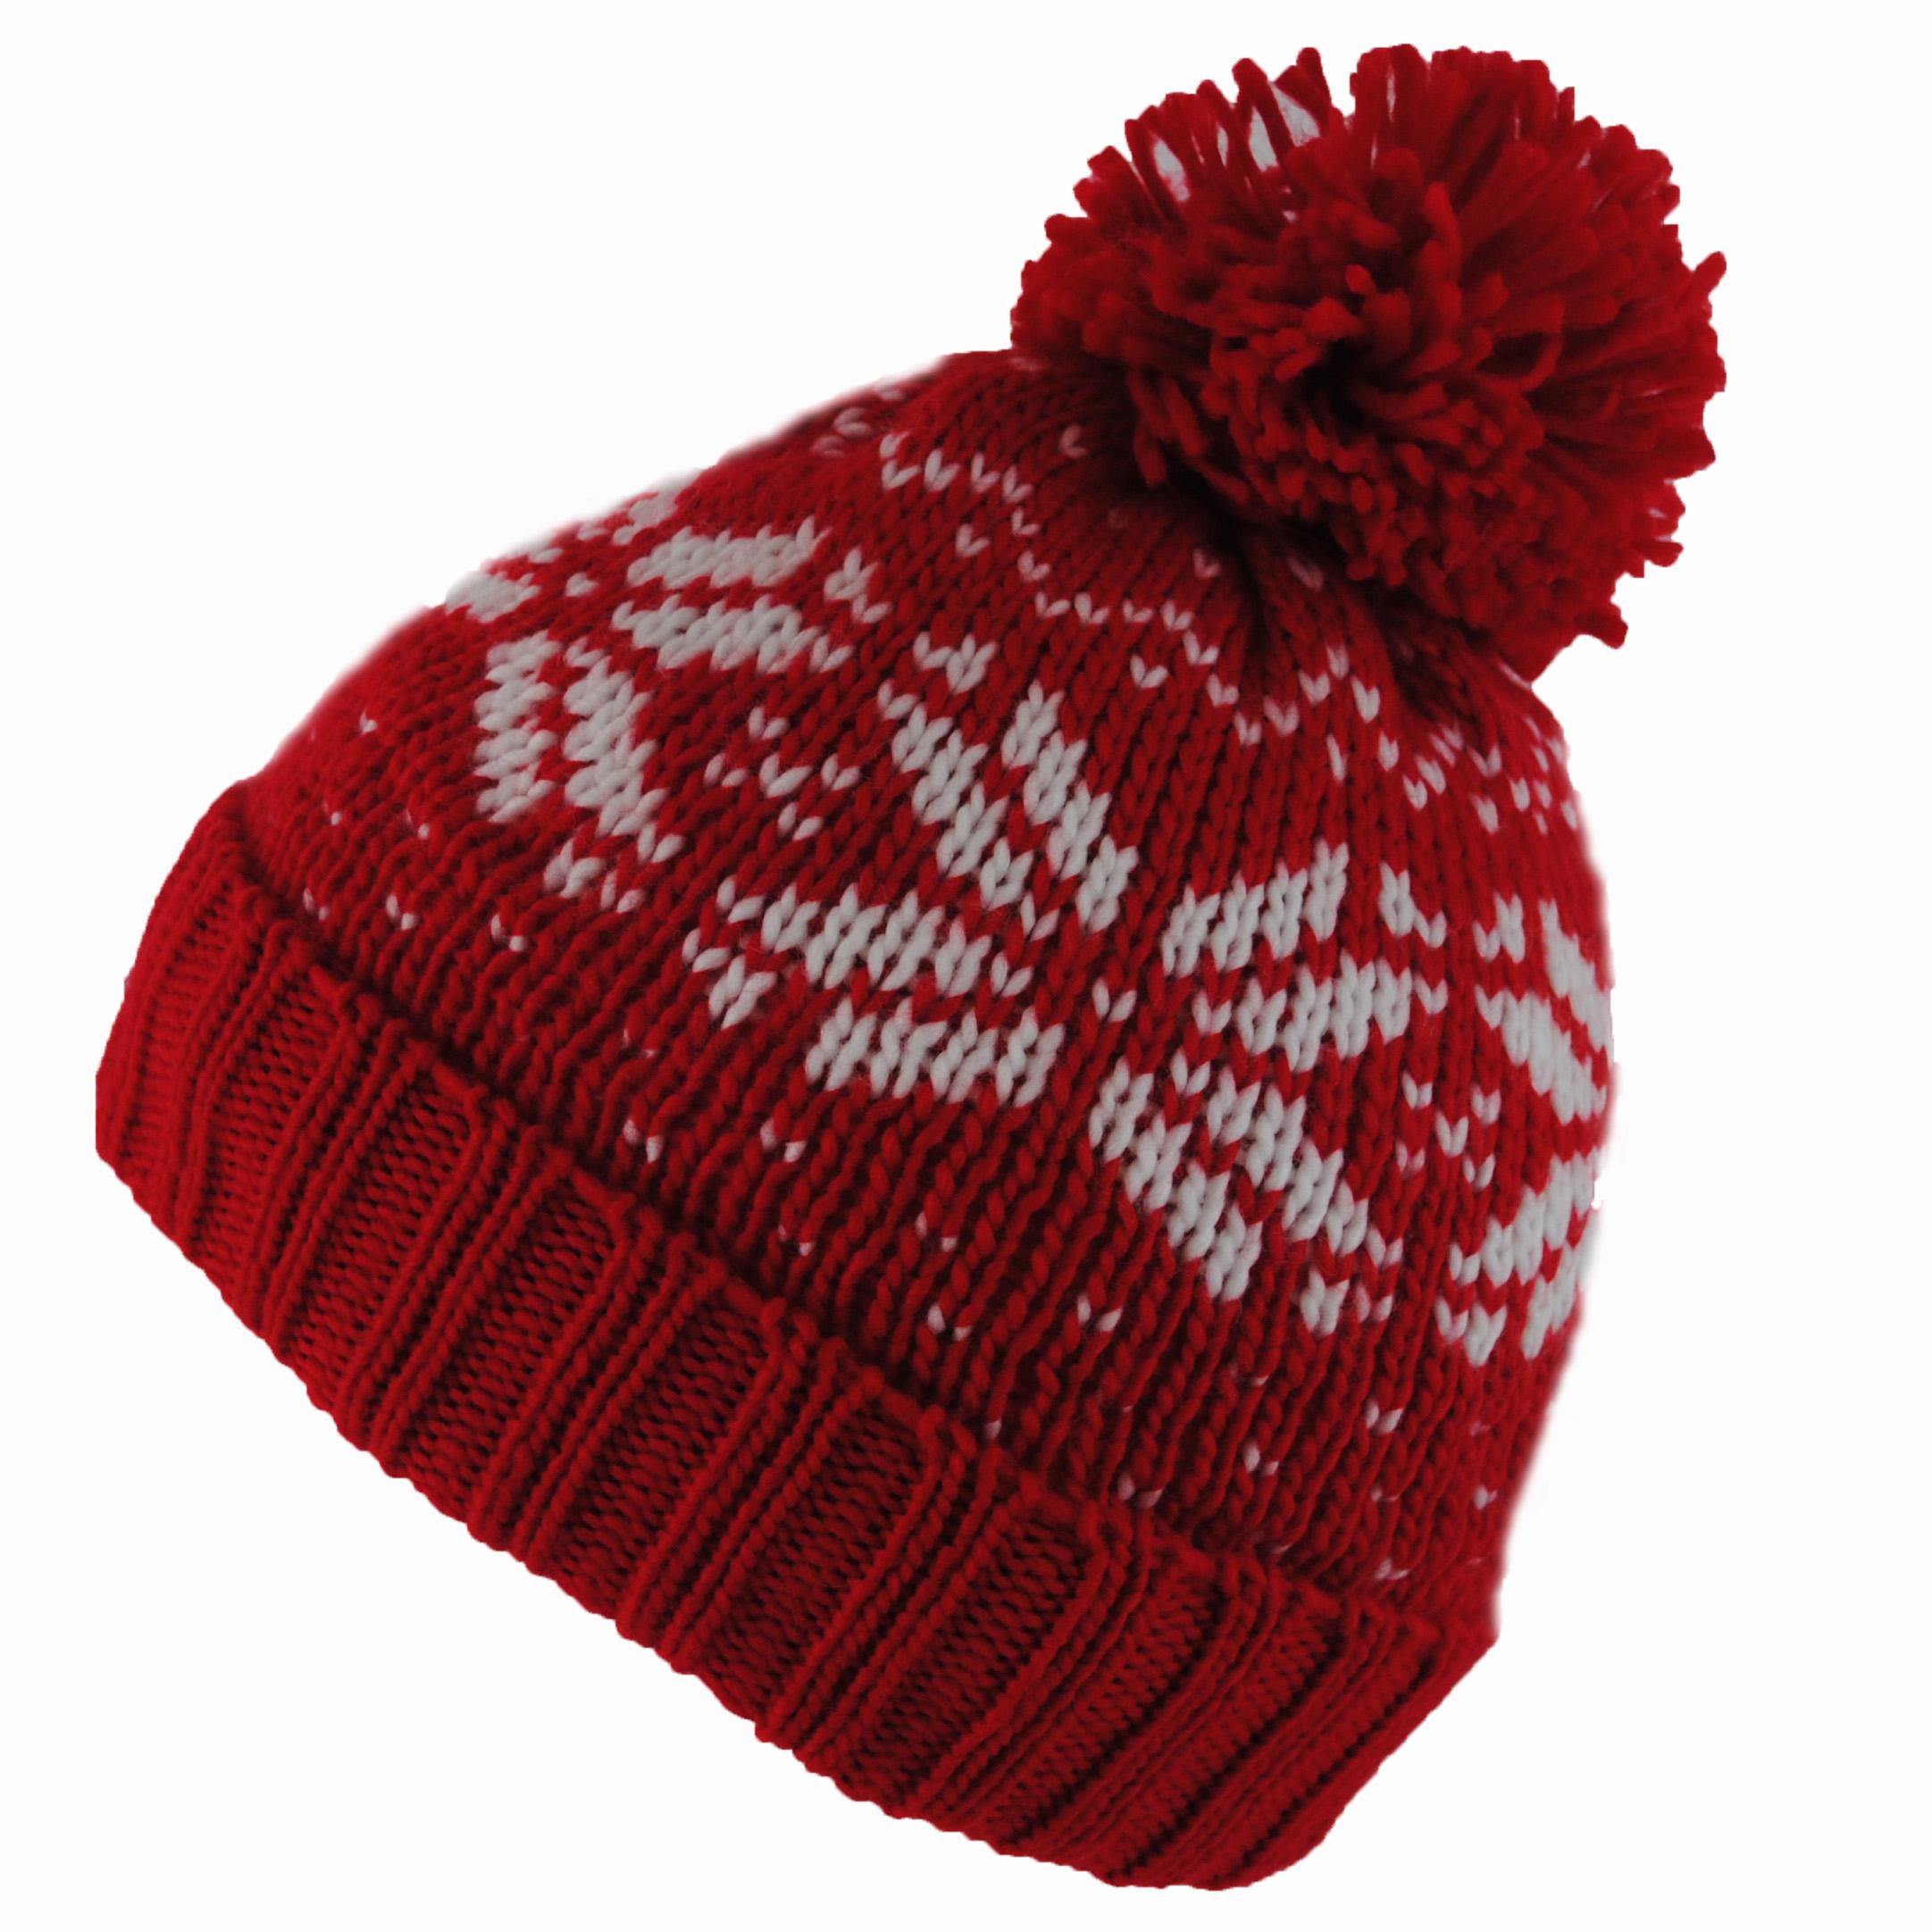 BNWT Fair Isle Snowstar Black RED Winter Wooly Roll UP ...